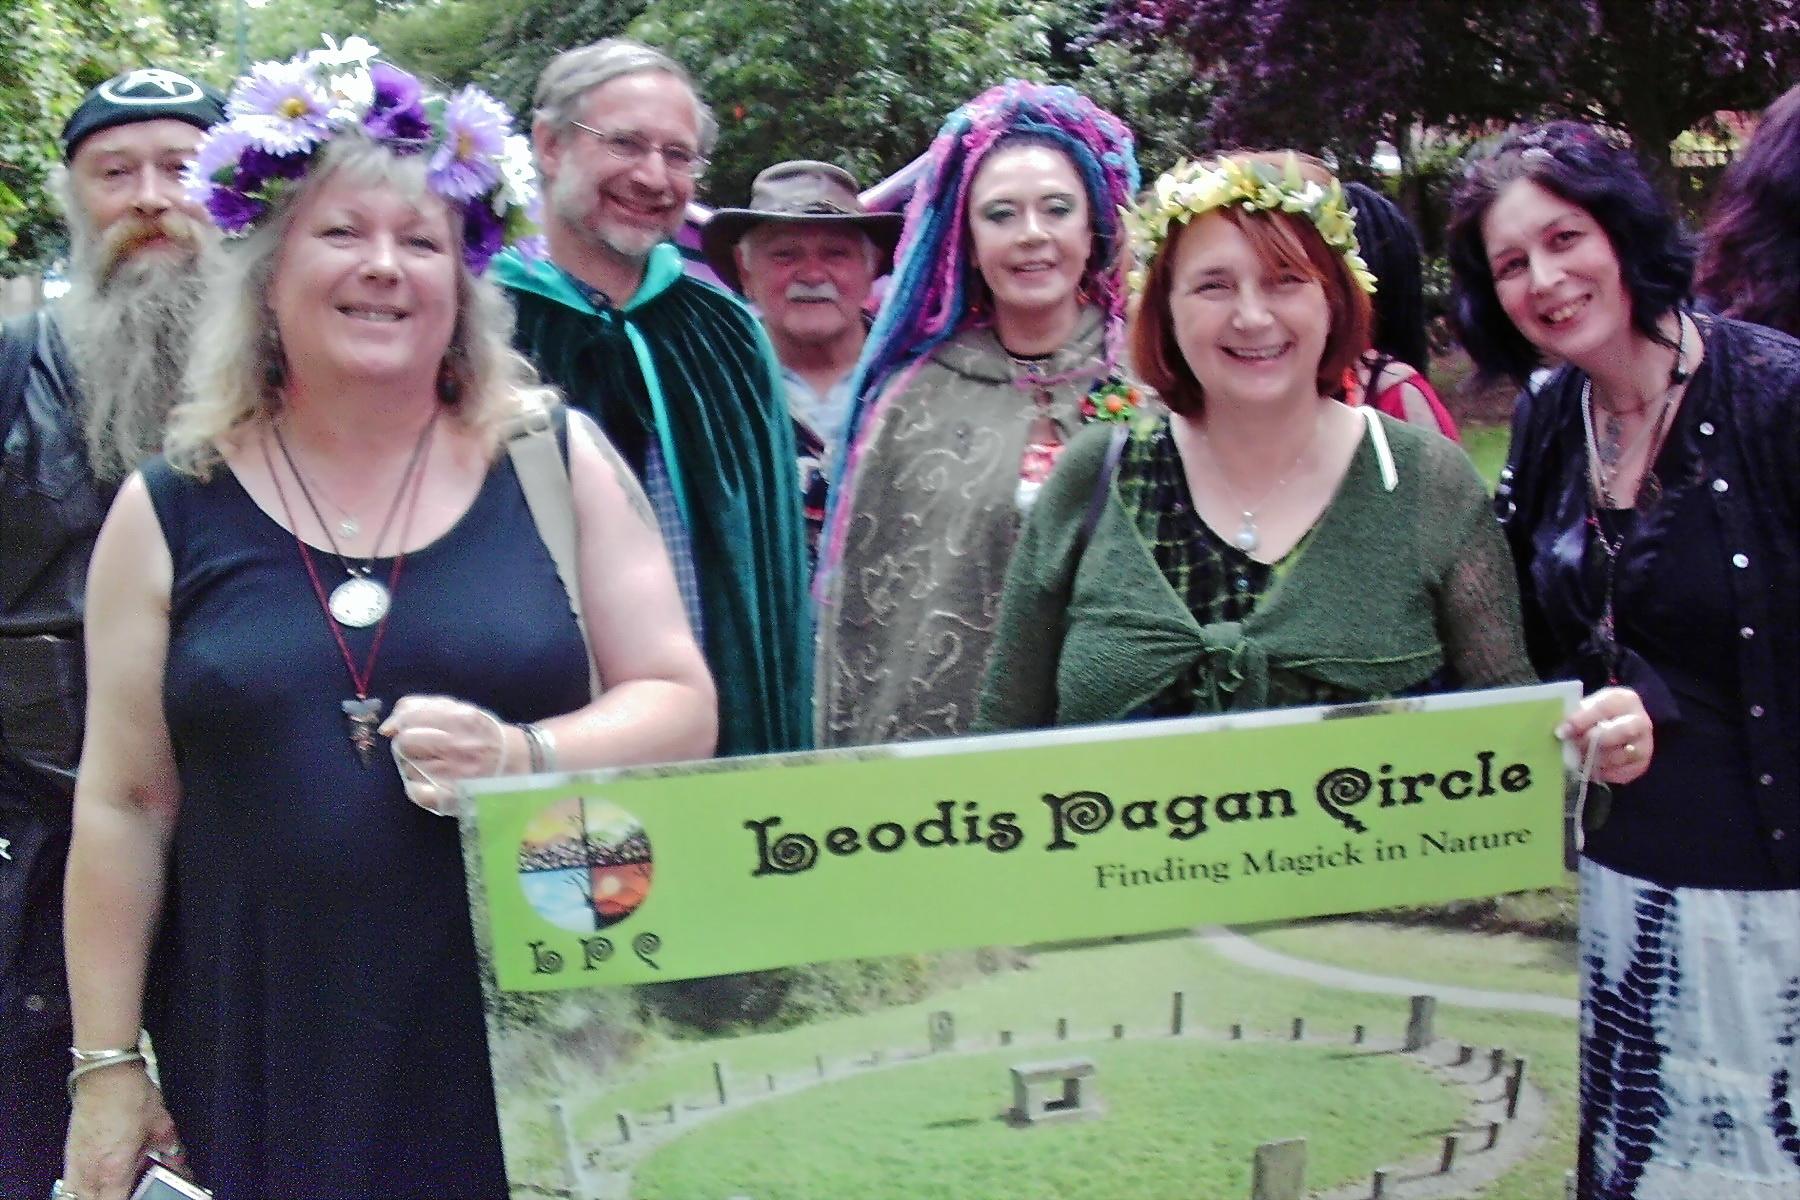 Other Events | Leodis Pagan Circle